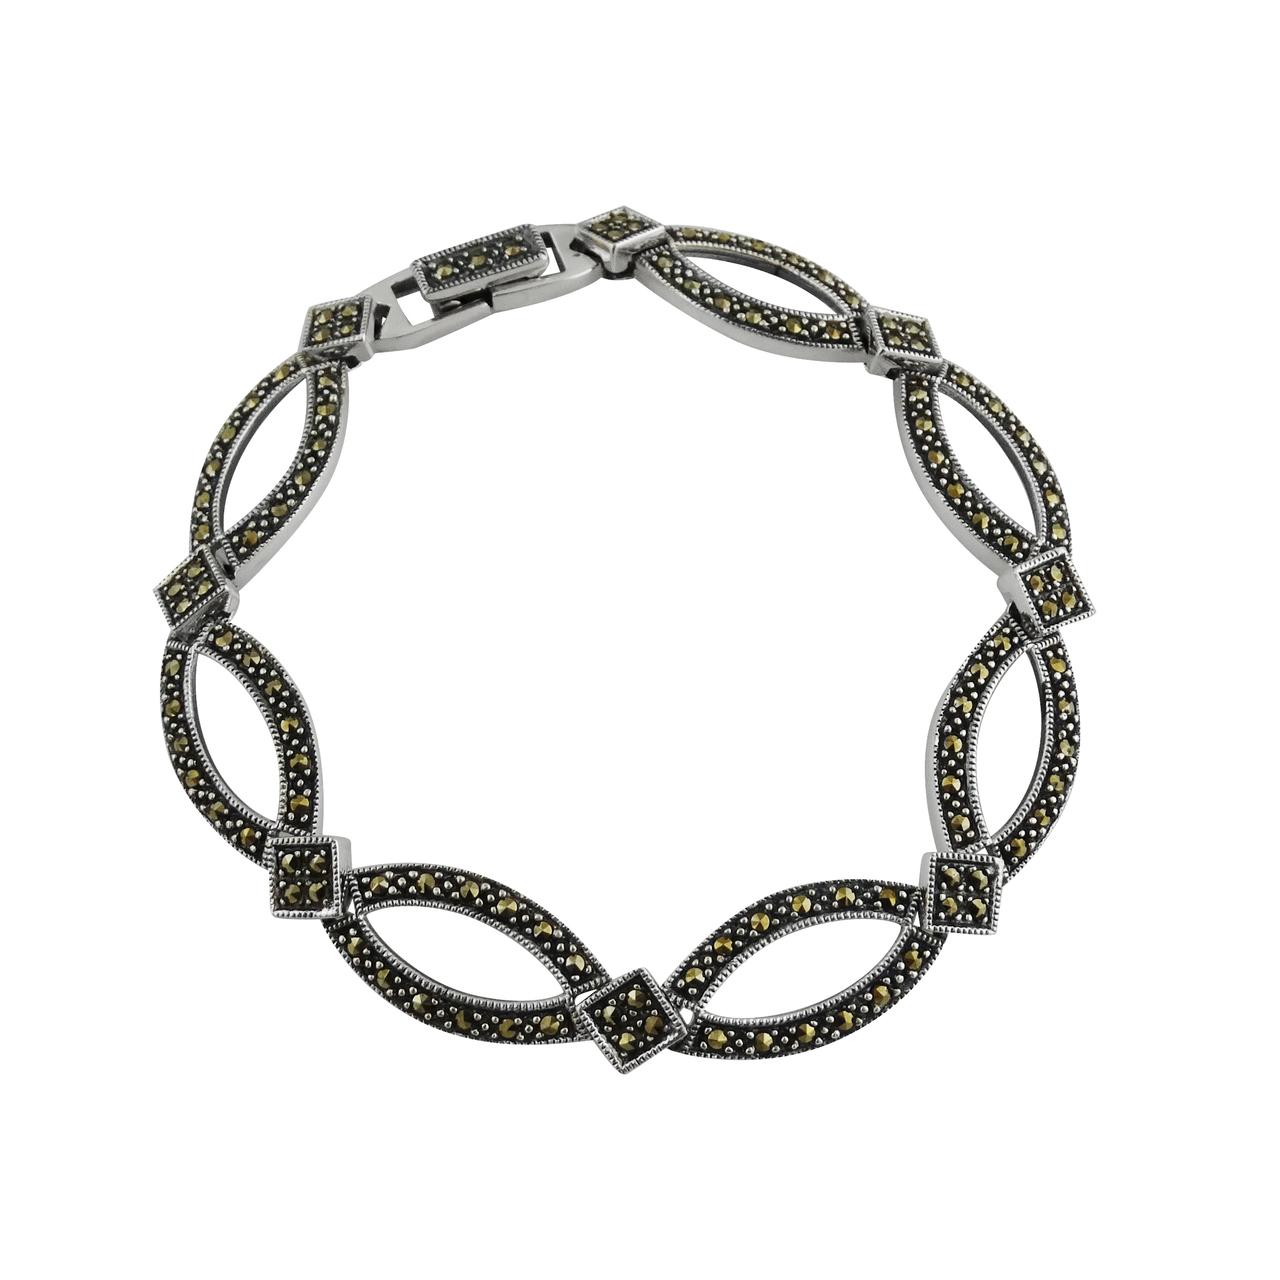 ''Sterling Silver Marcasite Geometric Almond Shaped 7'''' Link Bracelet''